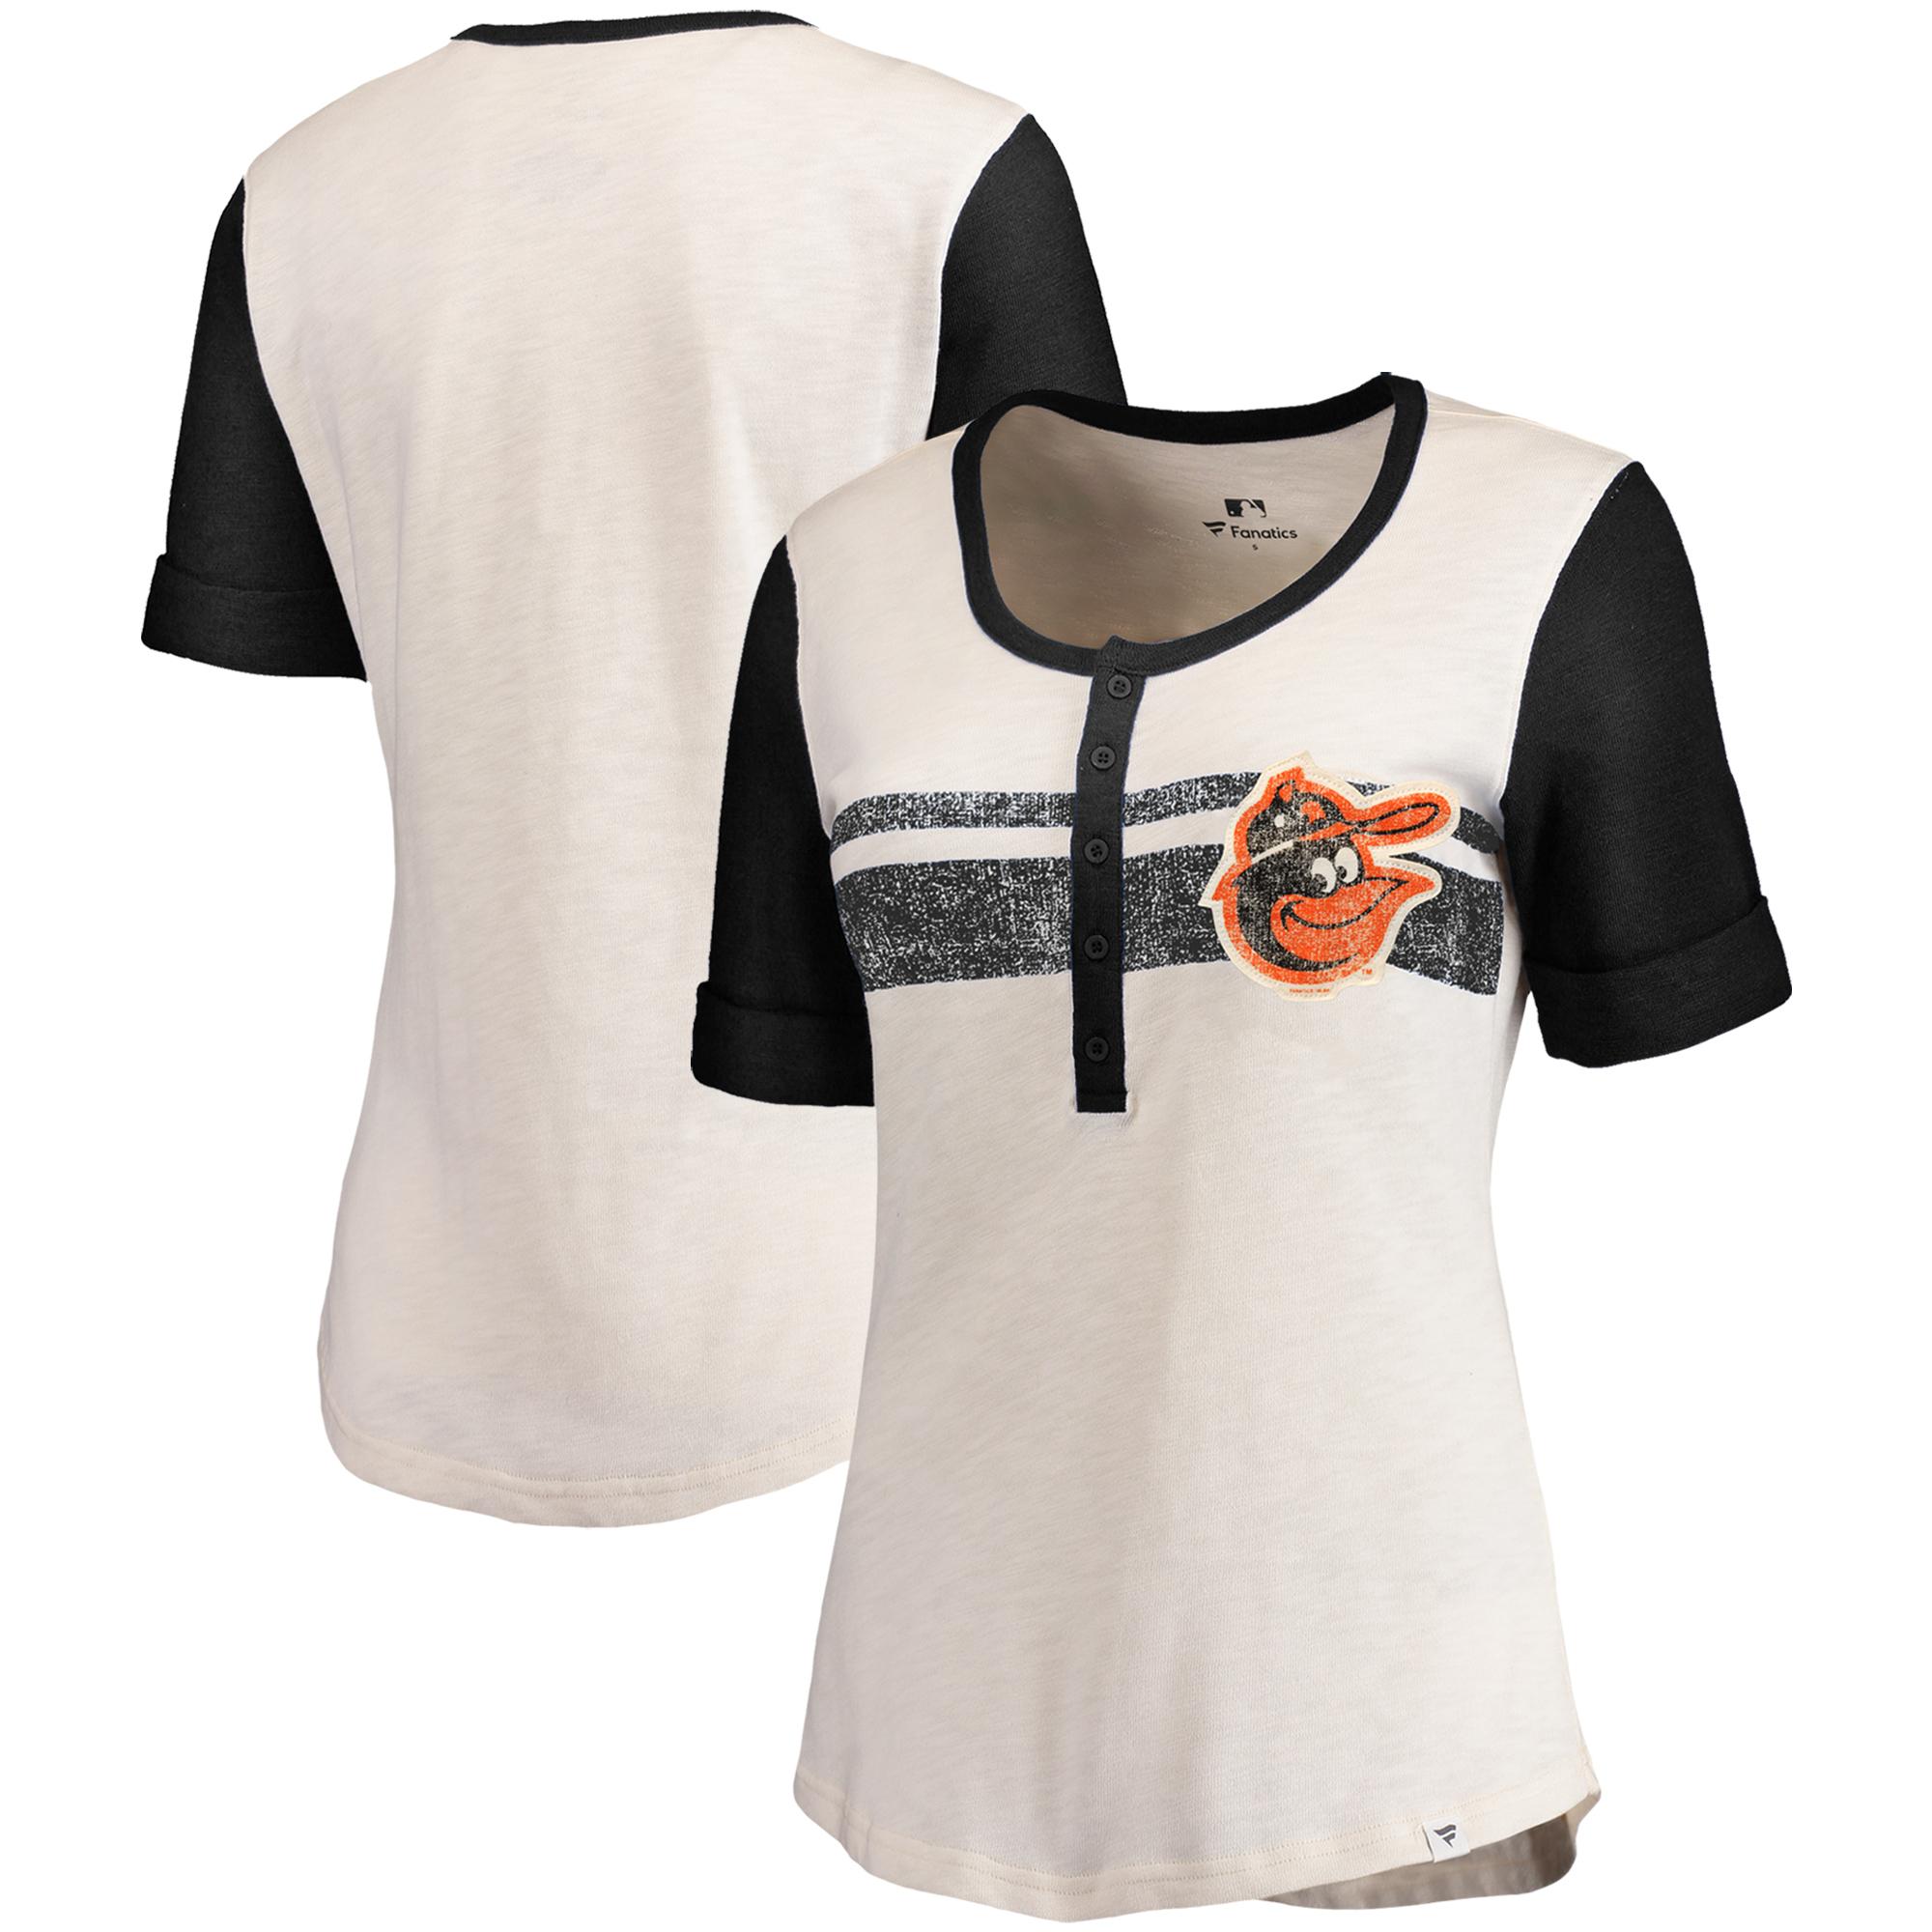 Baltimore Orioles Fanatics Branded Women's True Classics Henley T-Shirt - Cream/Black